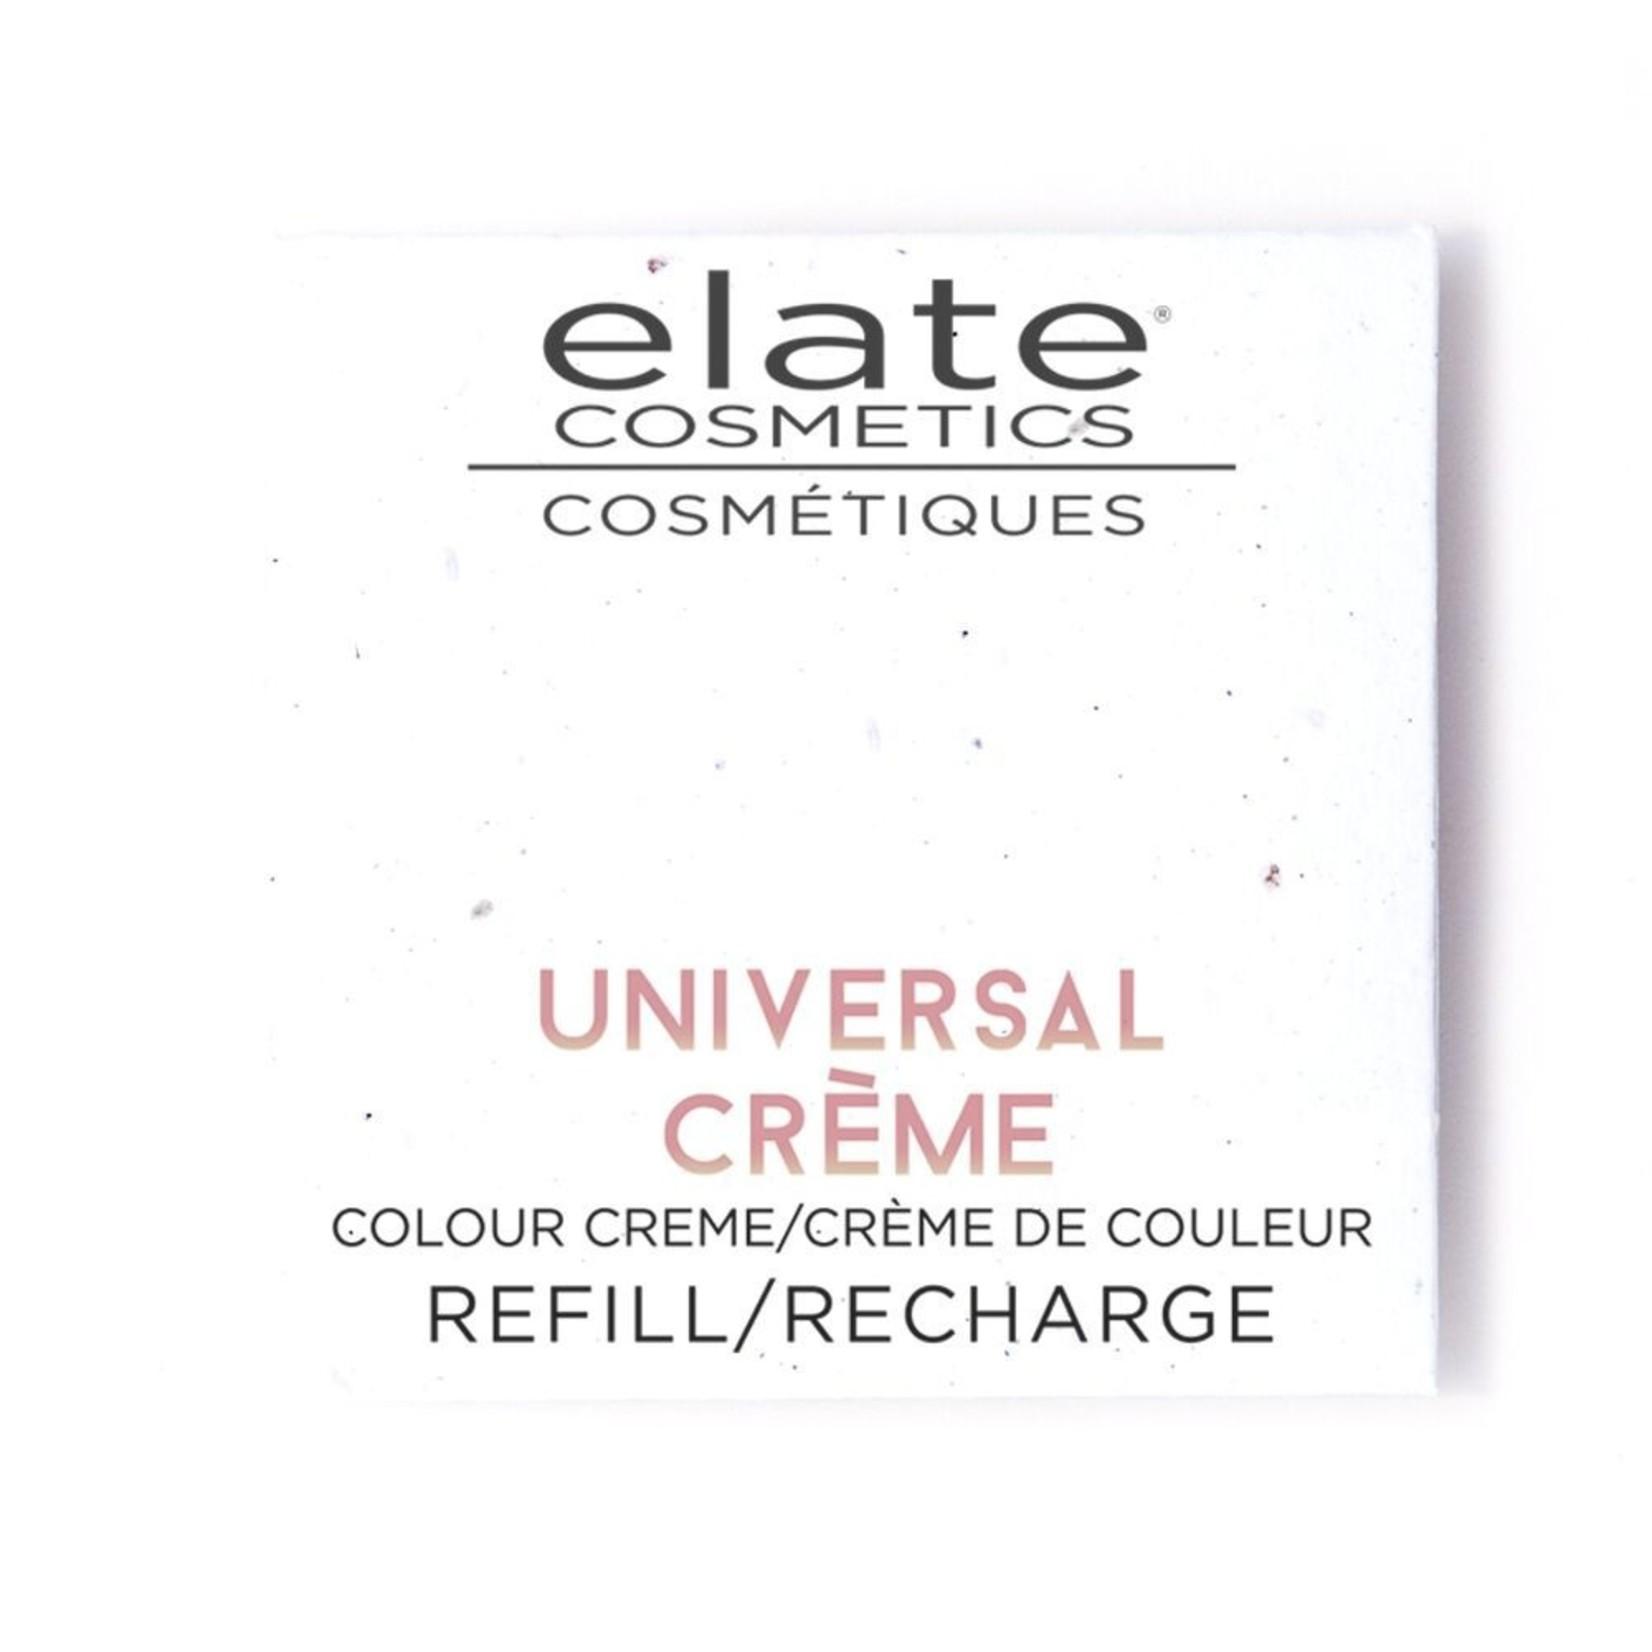 ELATE COSMETICS UNIVERSAL CREME - WONDER HIGHLIGHT